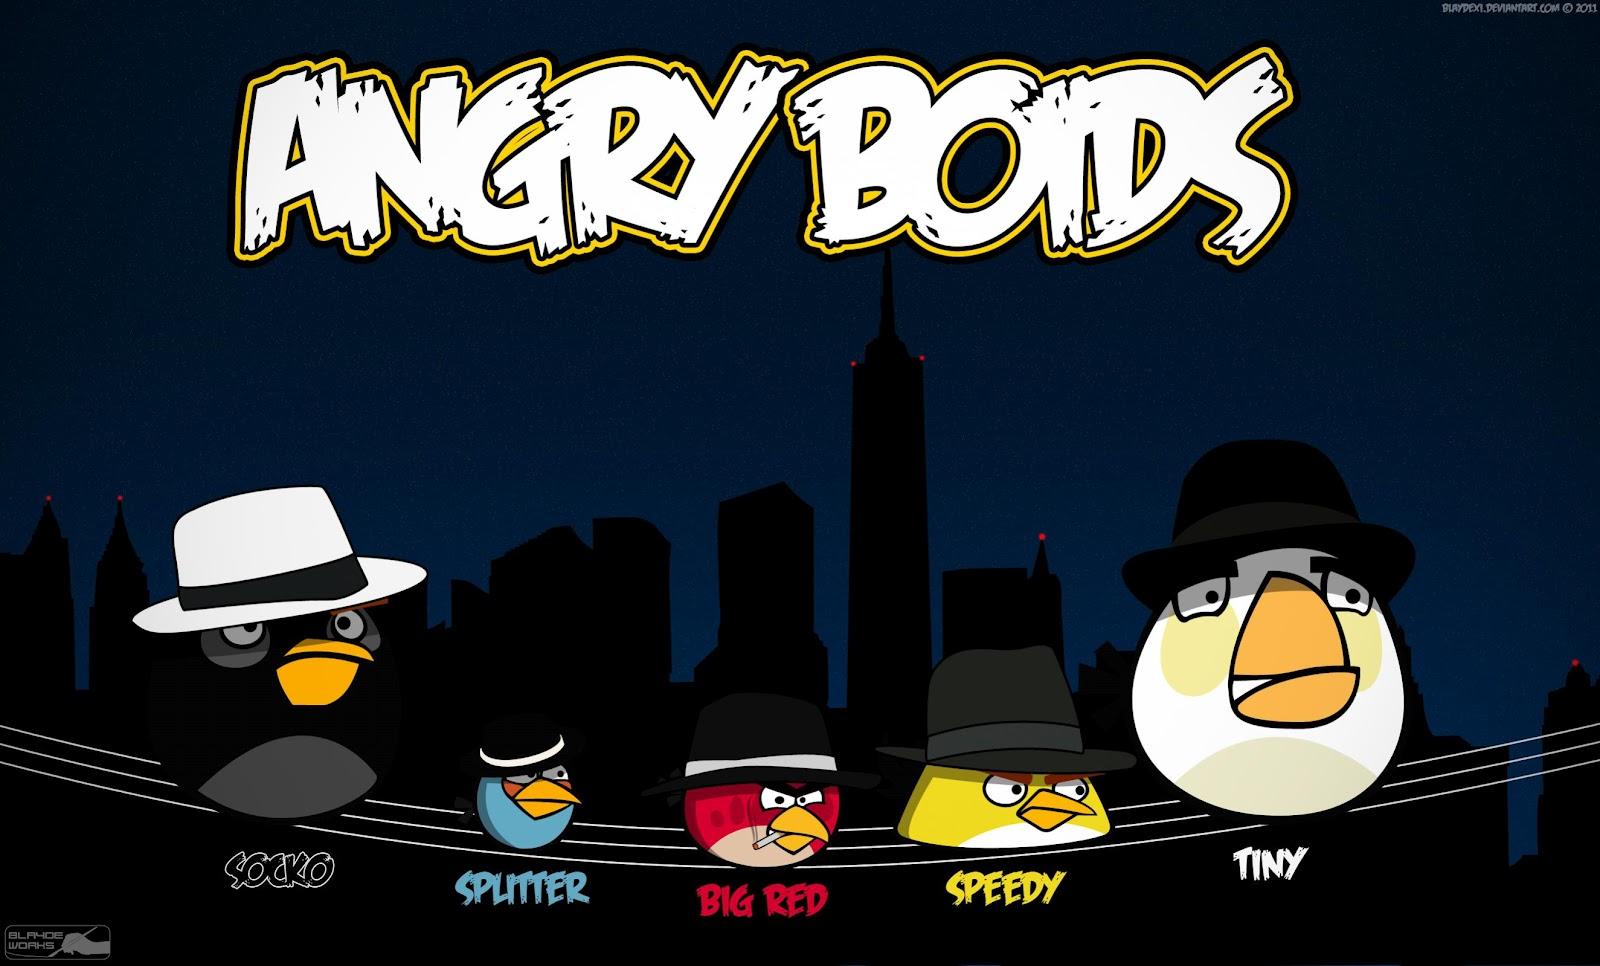 http://1.bp.blogspot.com/-w18uGHnBHLM/UCFQriJTQlI/AAAAAAAAAbw/KLPb1VYbiq0/s1600/angry_boids_by_blaydexi-d3azfyt.jpg